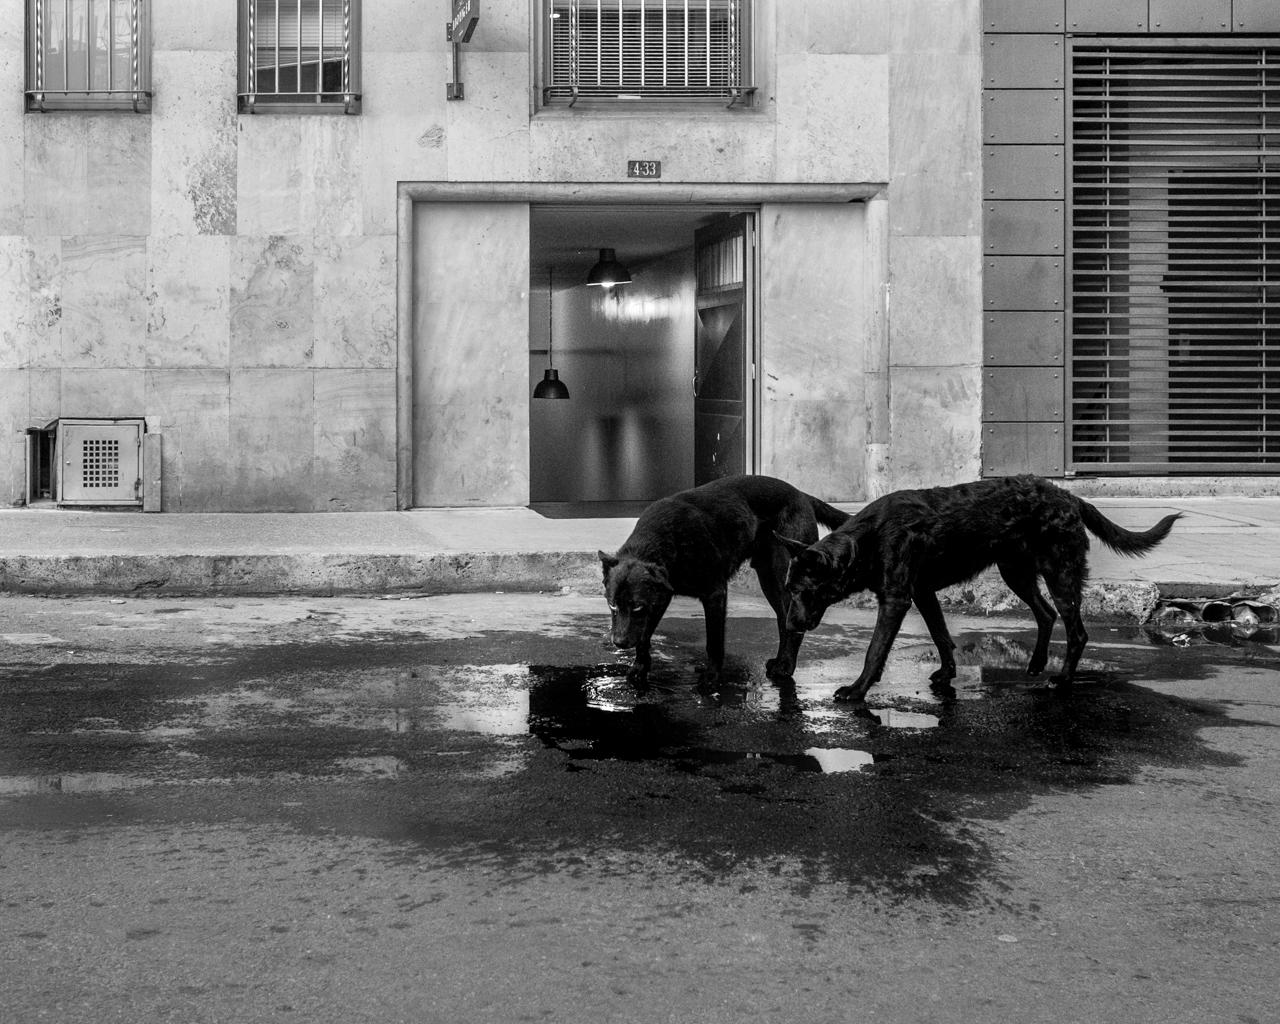 Stray dogs in Bogotá. Sept. 25, 2015. (Juan Cristóbal Cobo)